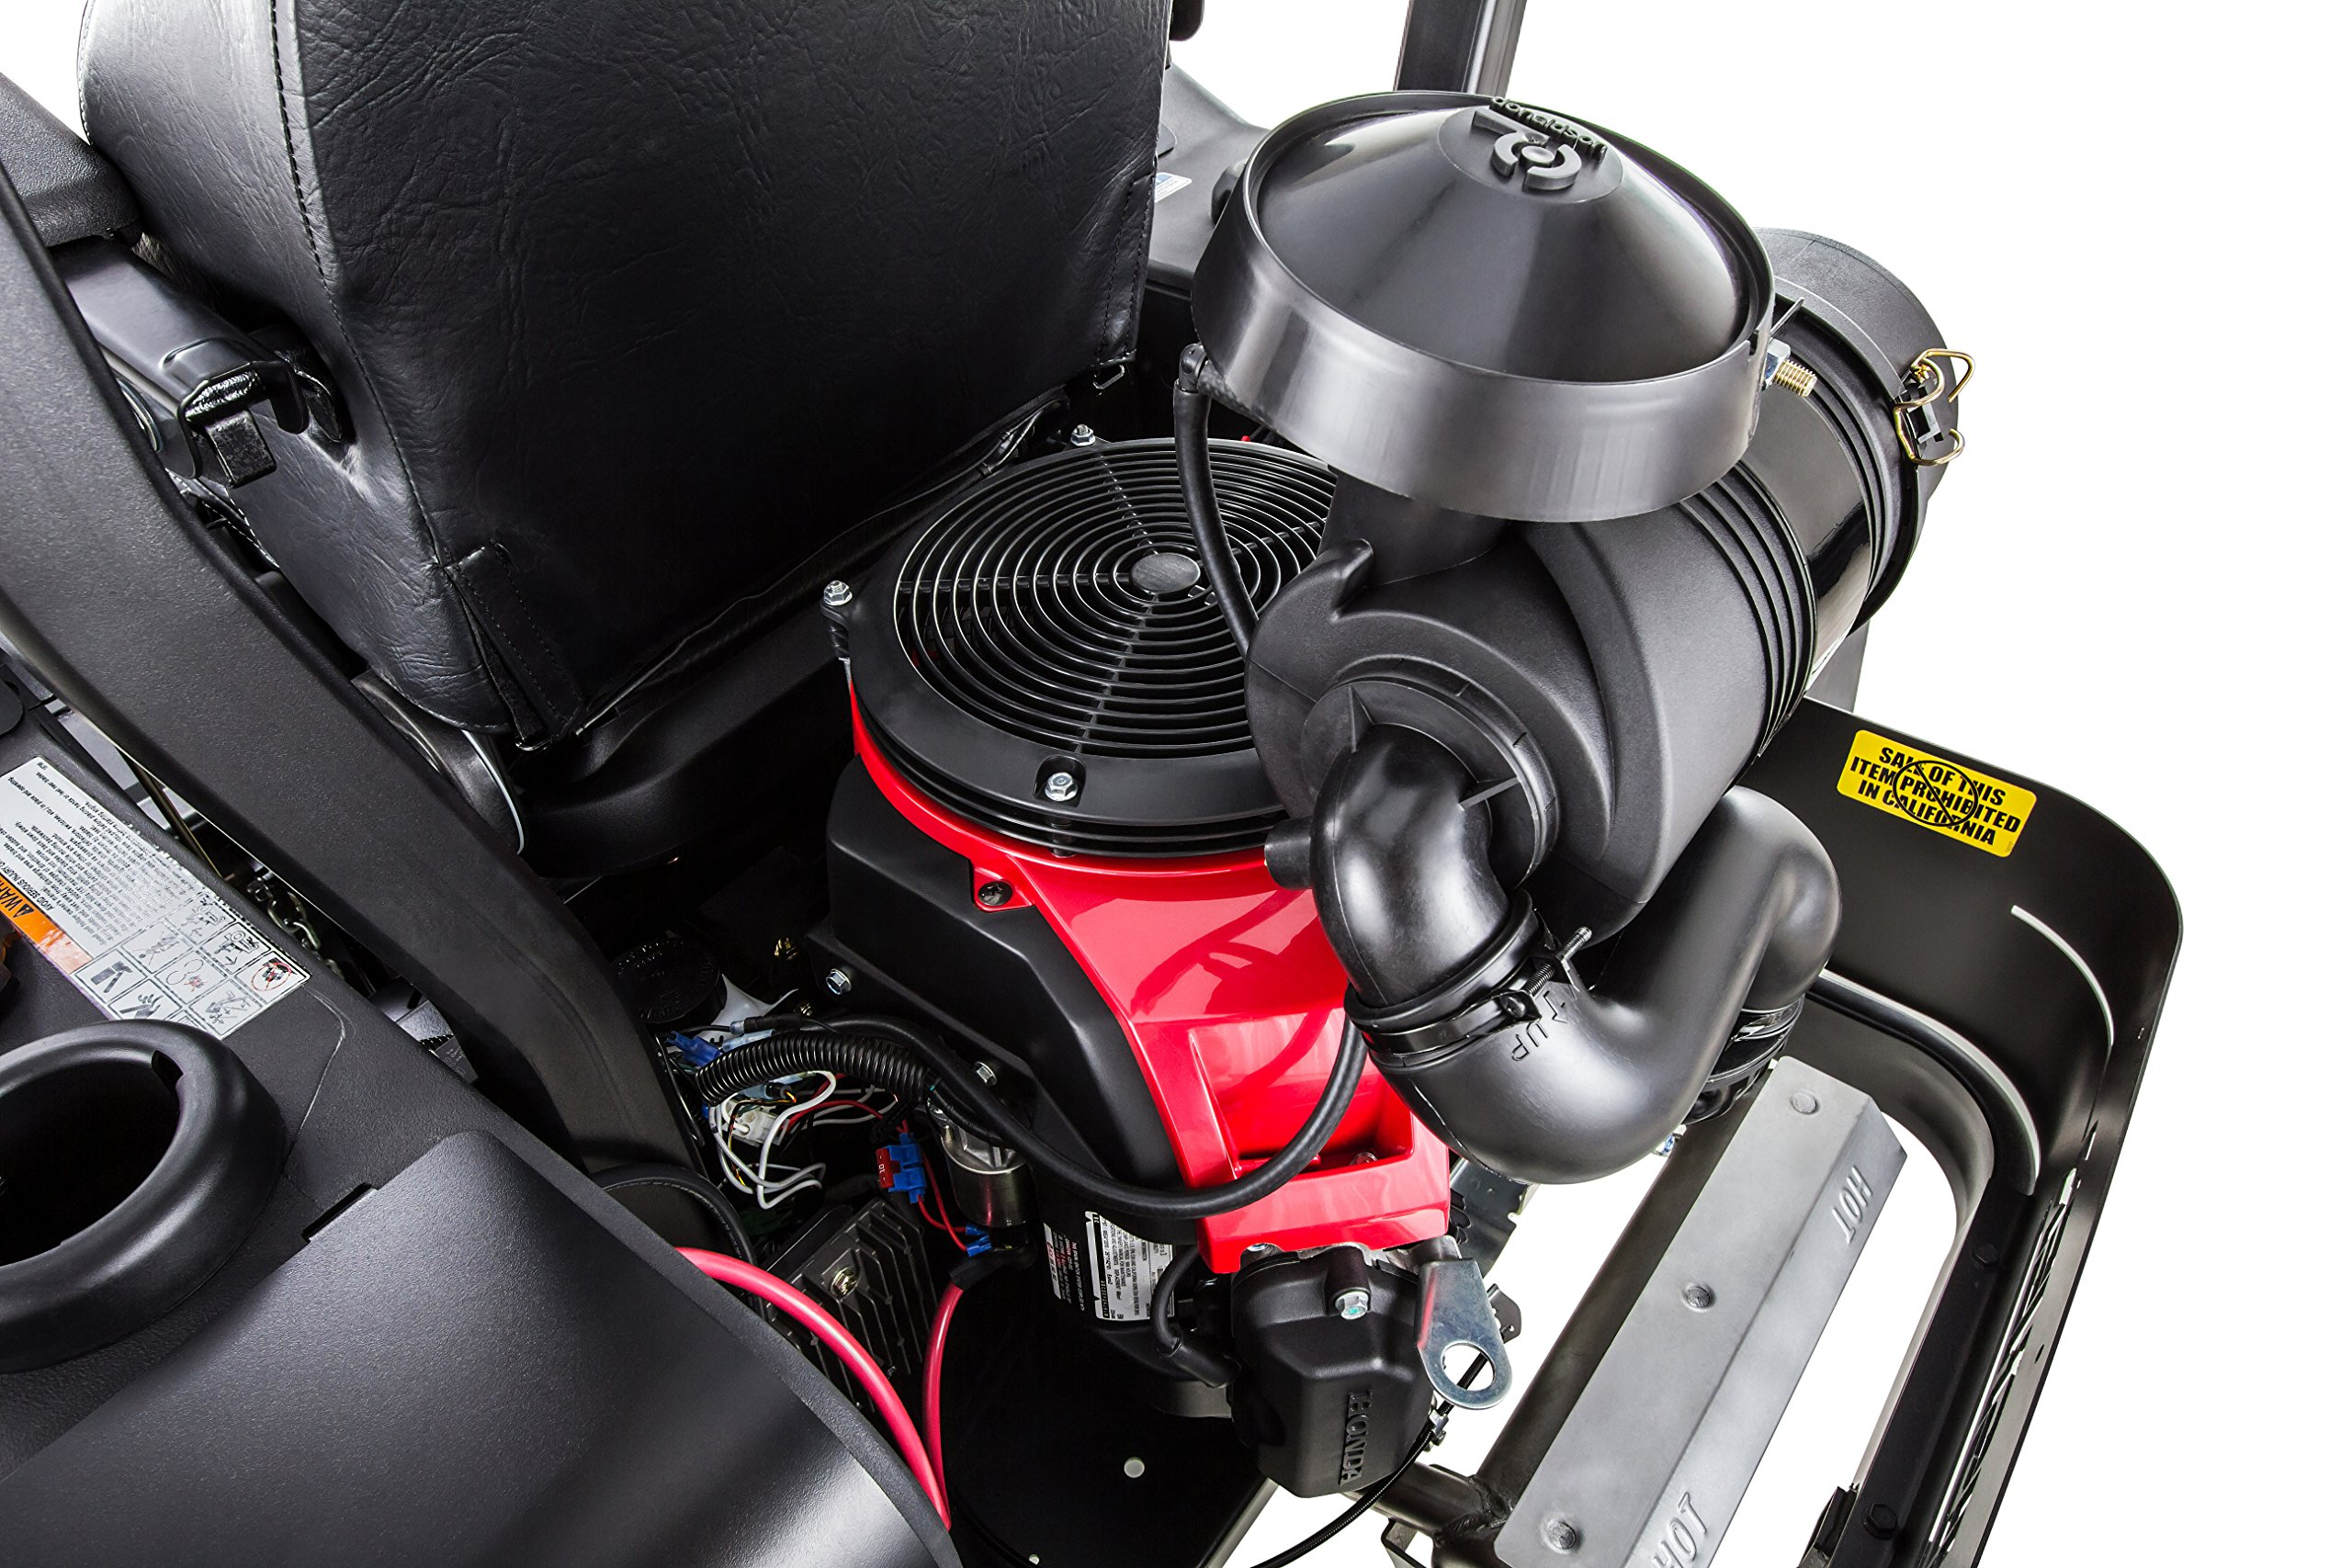 Swisher Z21554CPHO 21.5HP Reponse Gen 2 Honda Ztr Commercial Pro, Black, 54'' by Swisher (Image #10)